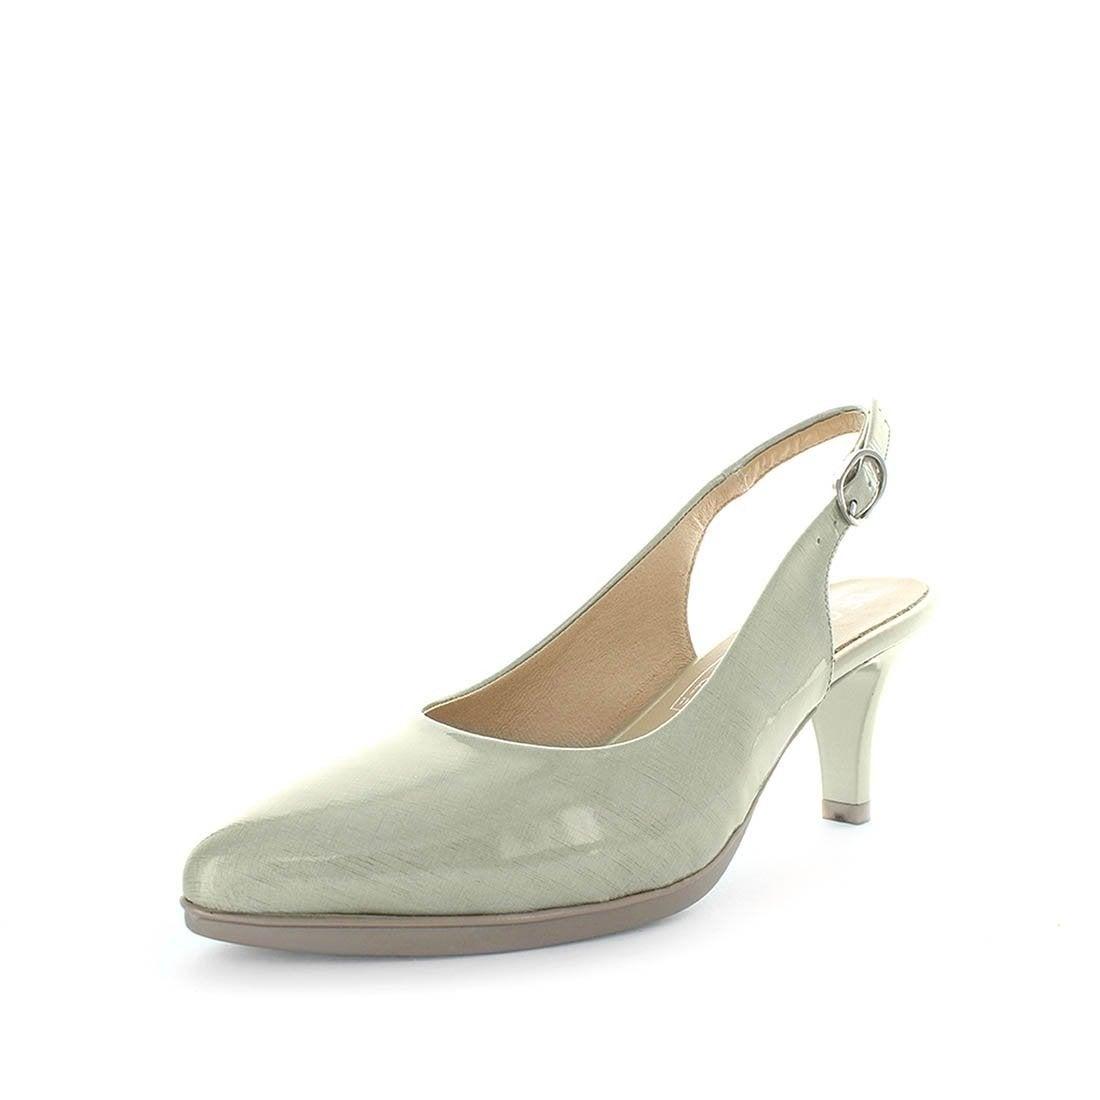 NEW Desiree Darette Stylish Patent Leather Women's Sling Back Sandals